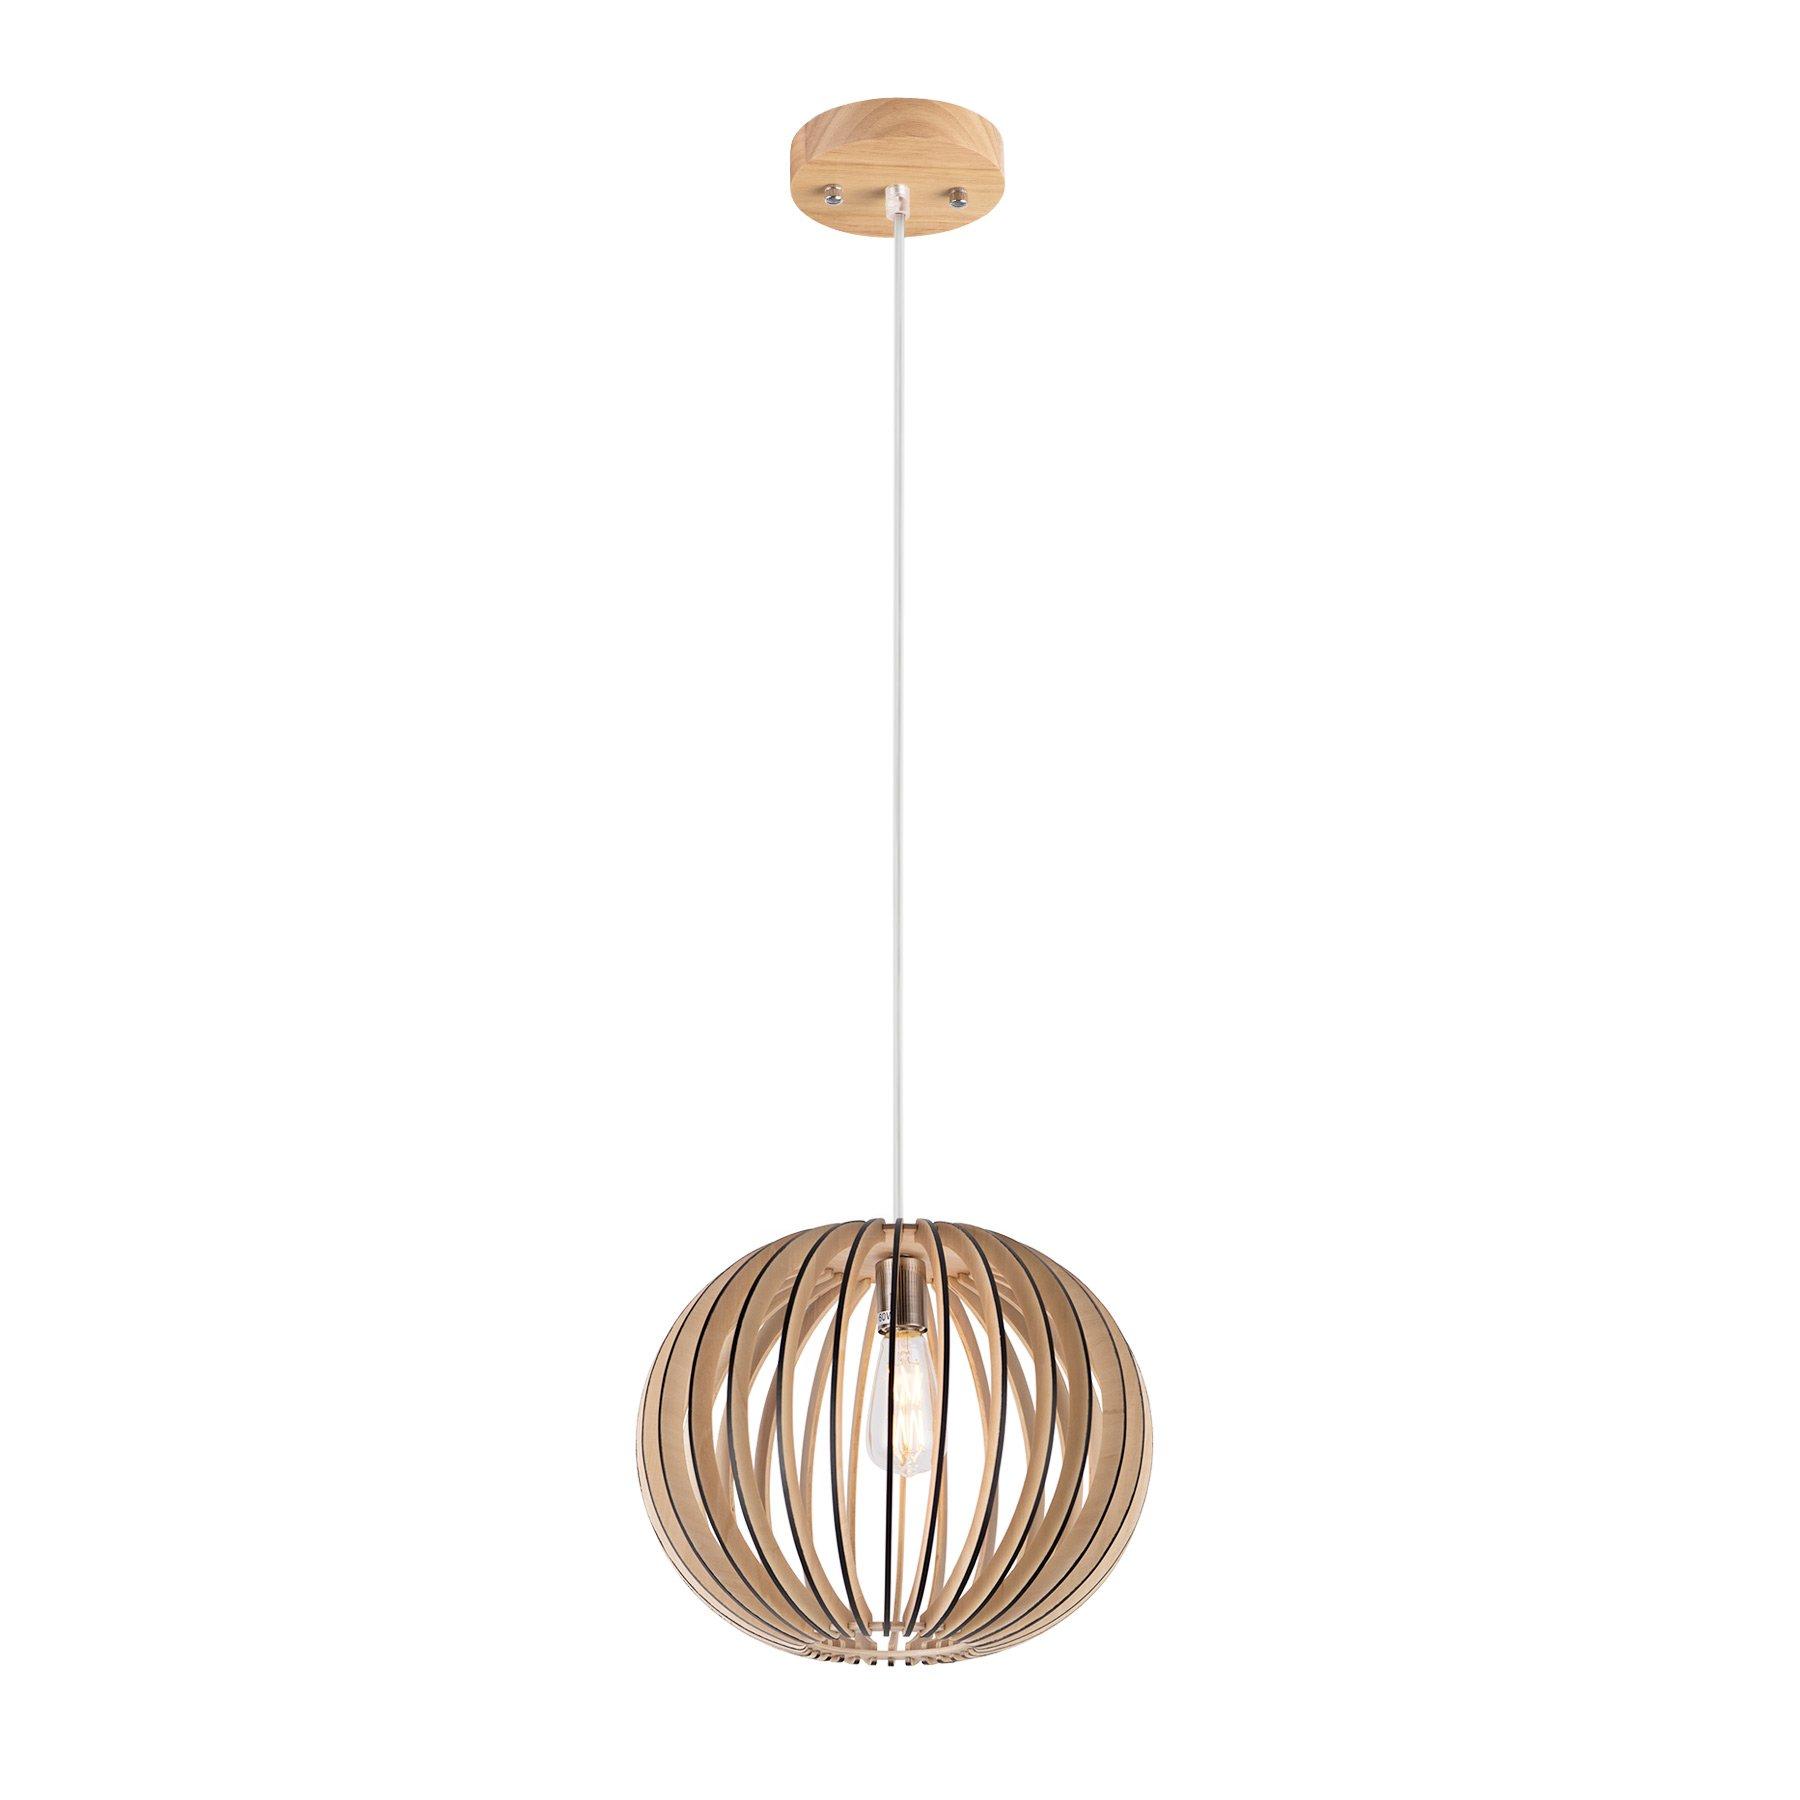 MAYKKE Melros Medium Wooden Pendant Lamp | Modern & Contemporary Hanging Ceiling Light | Lantern-Shaped Home Decor Lighting for Living Room, Kitchen | Natural Wood Finish MDB1100102